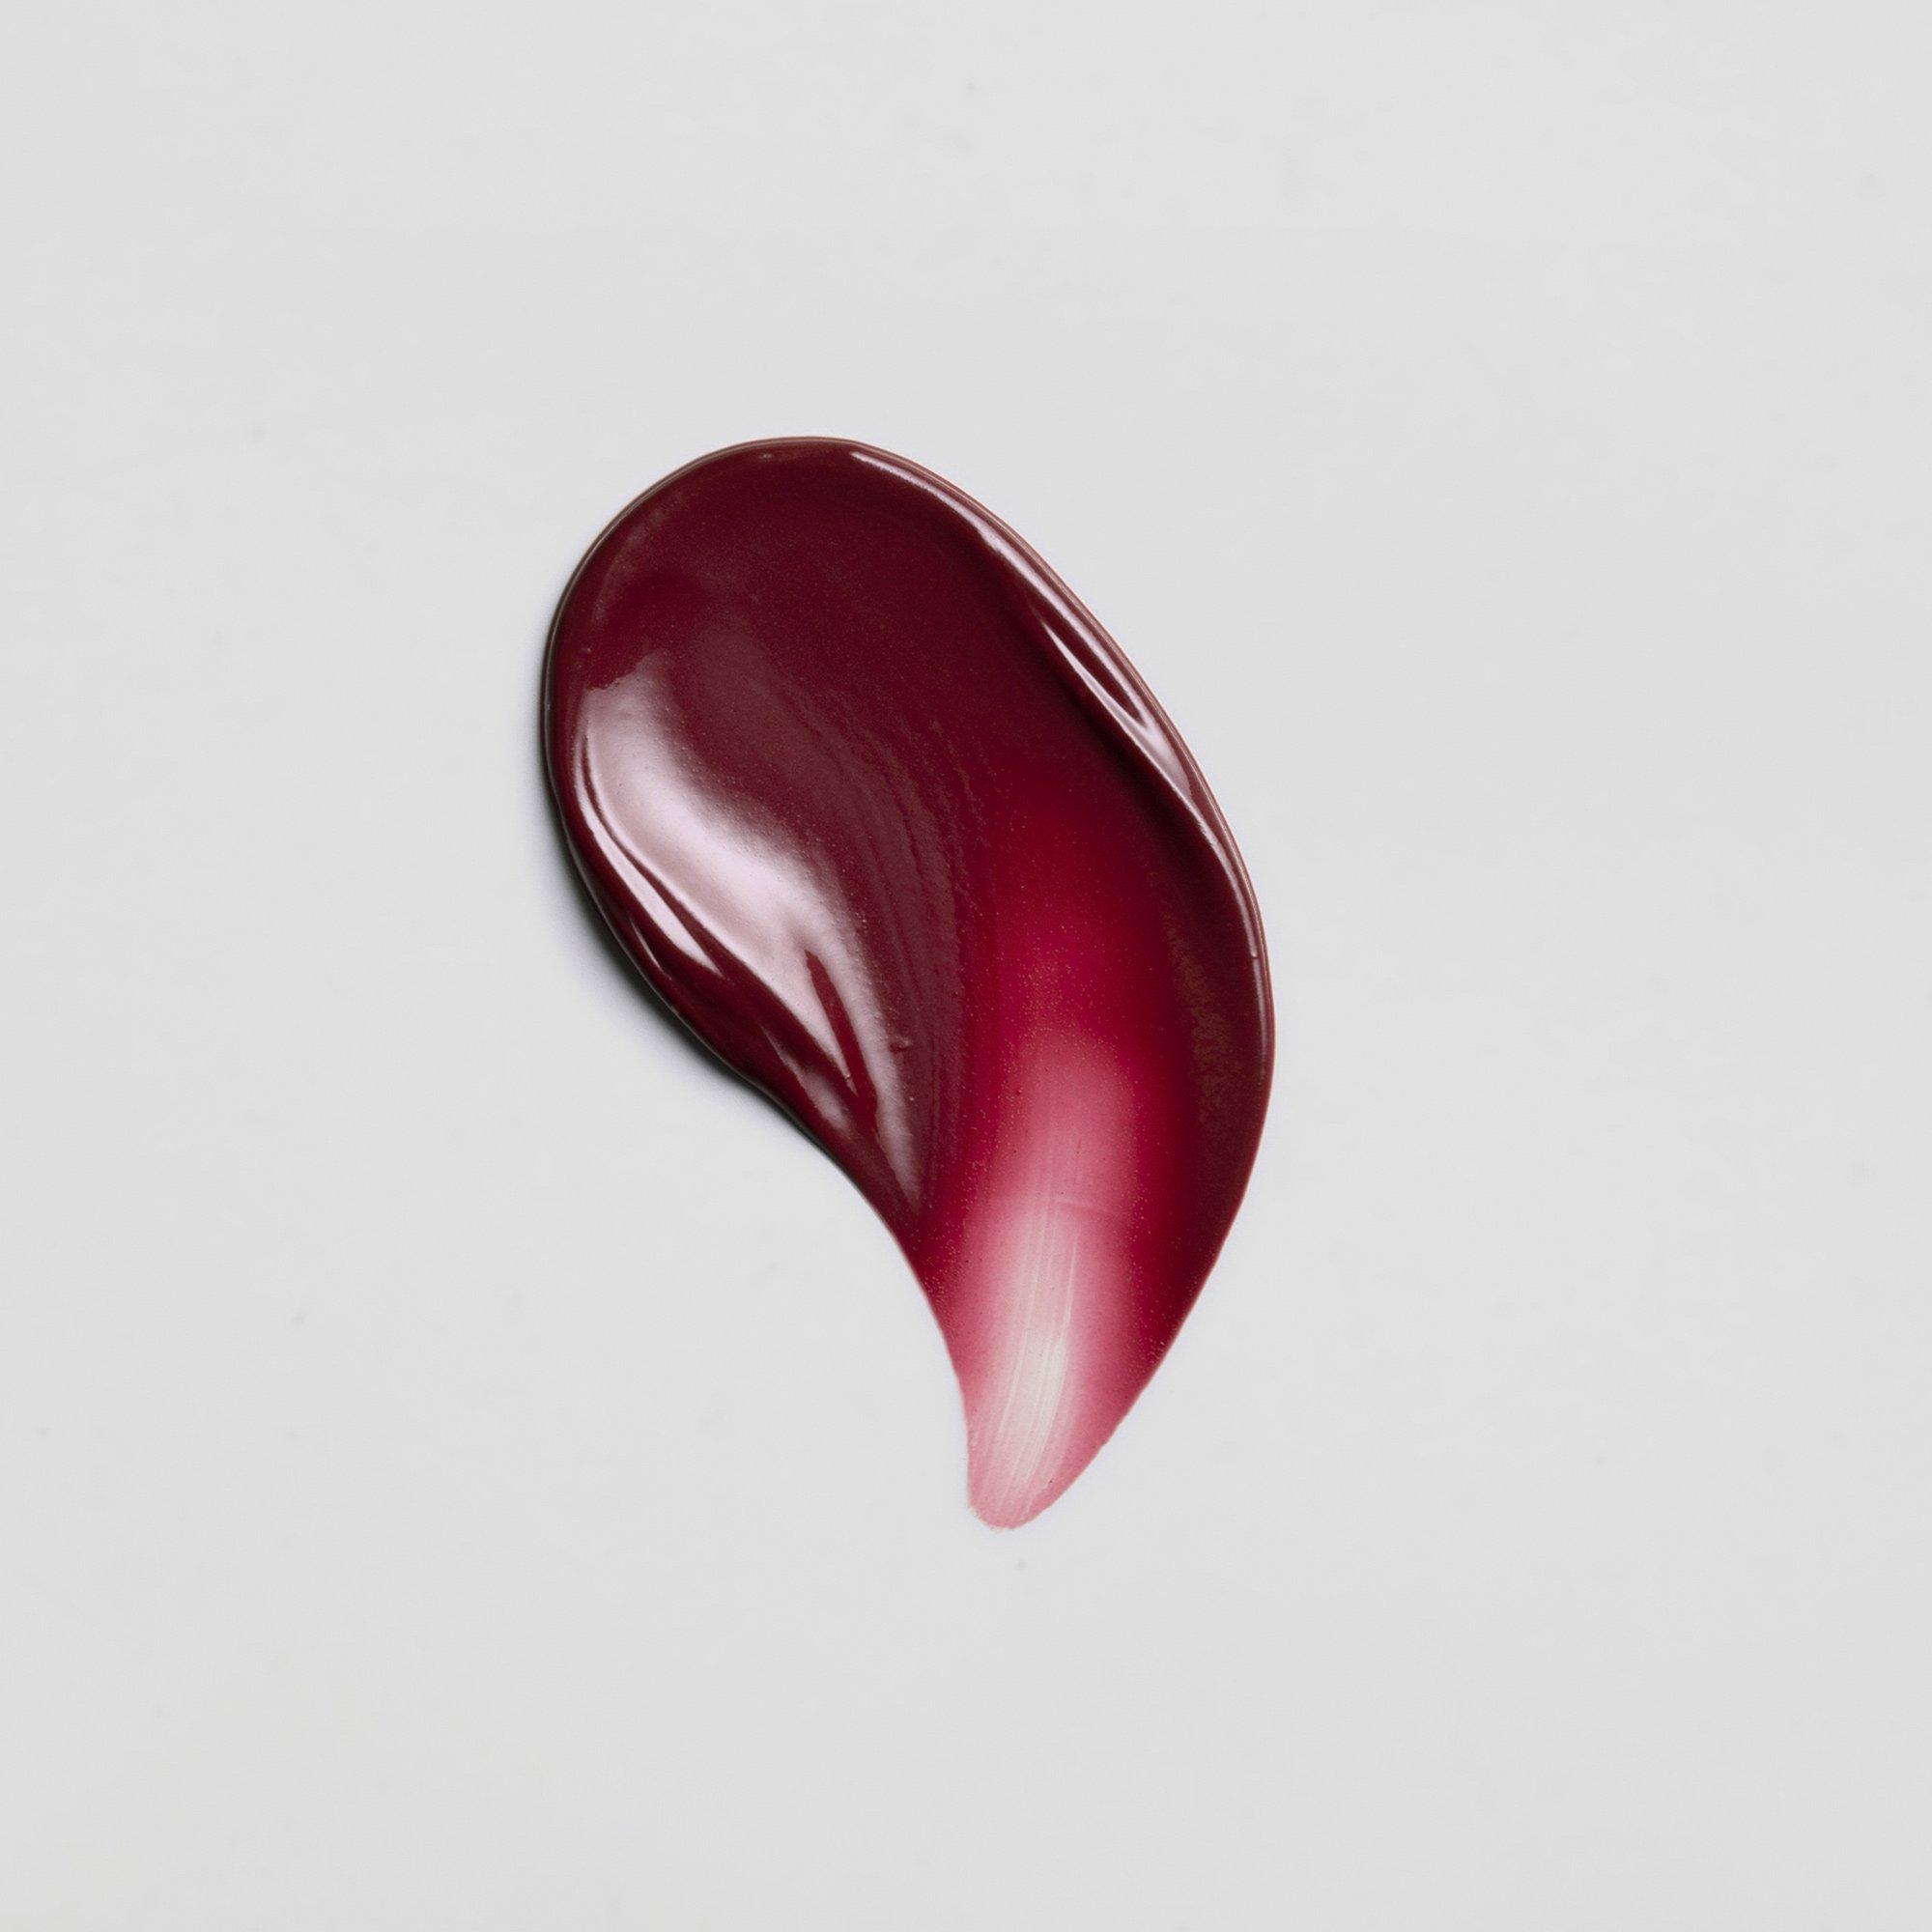 CHEEKSLIME Product Photo